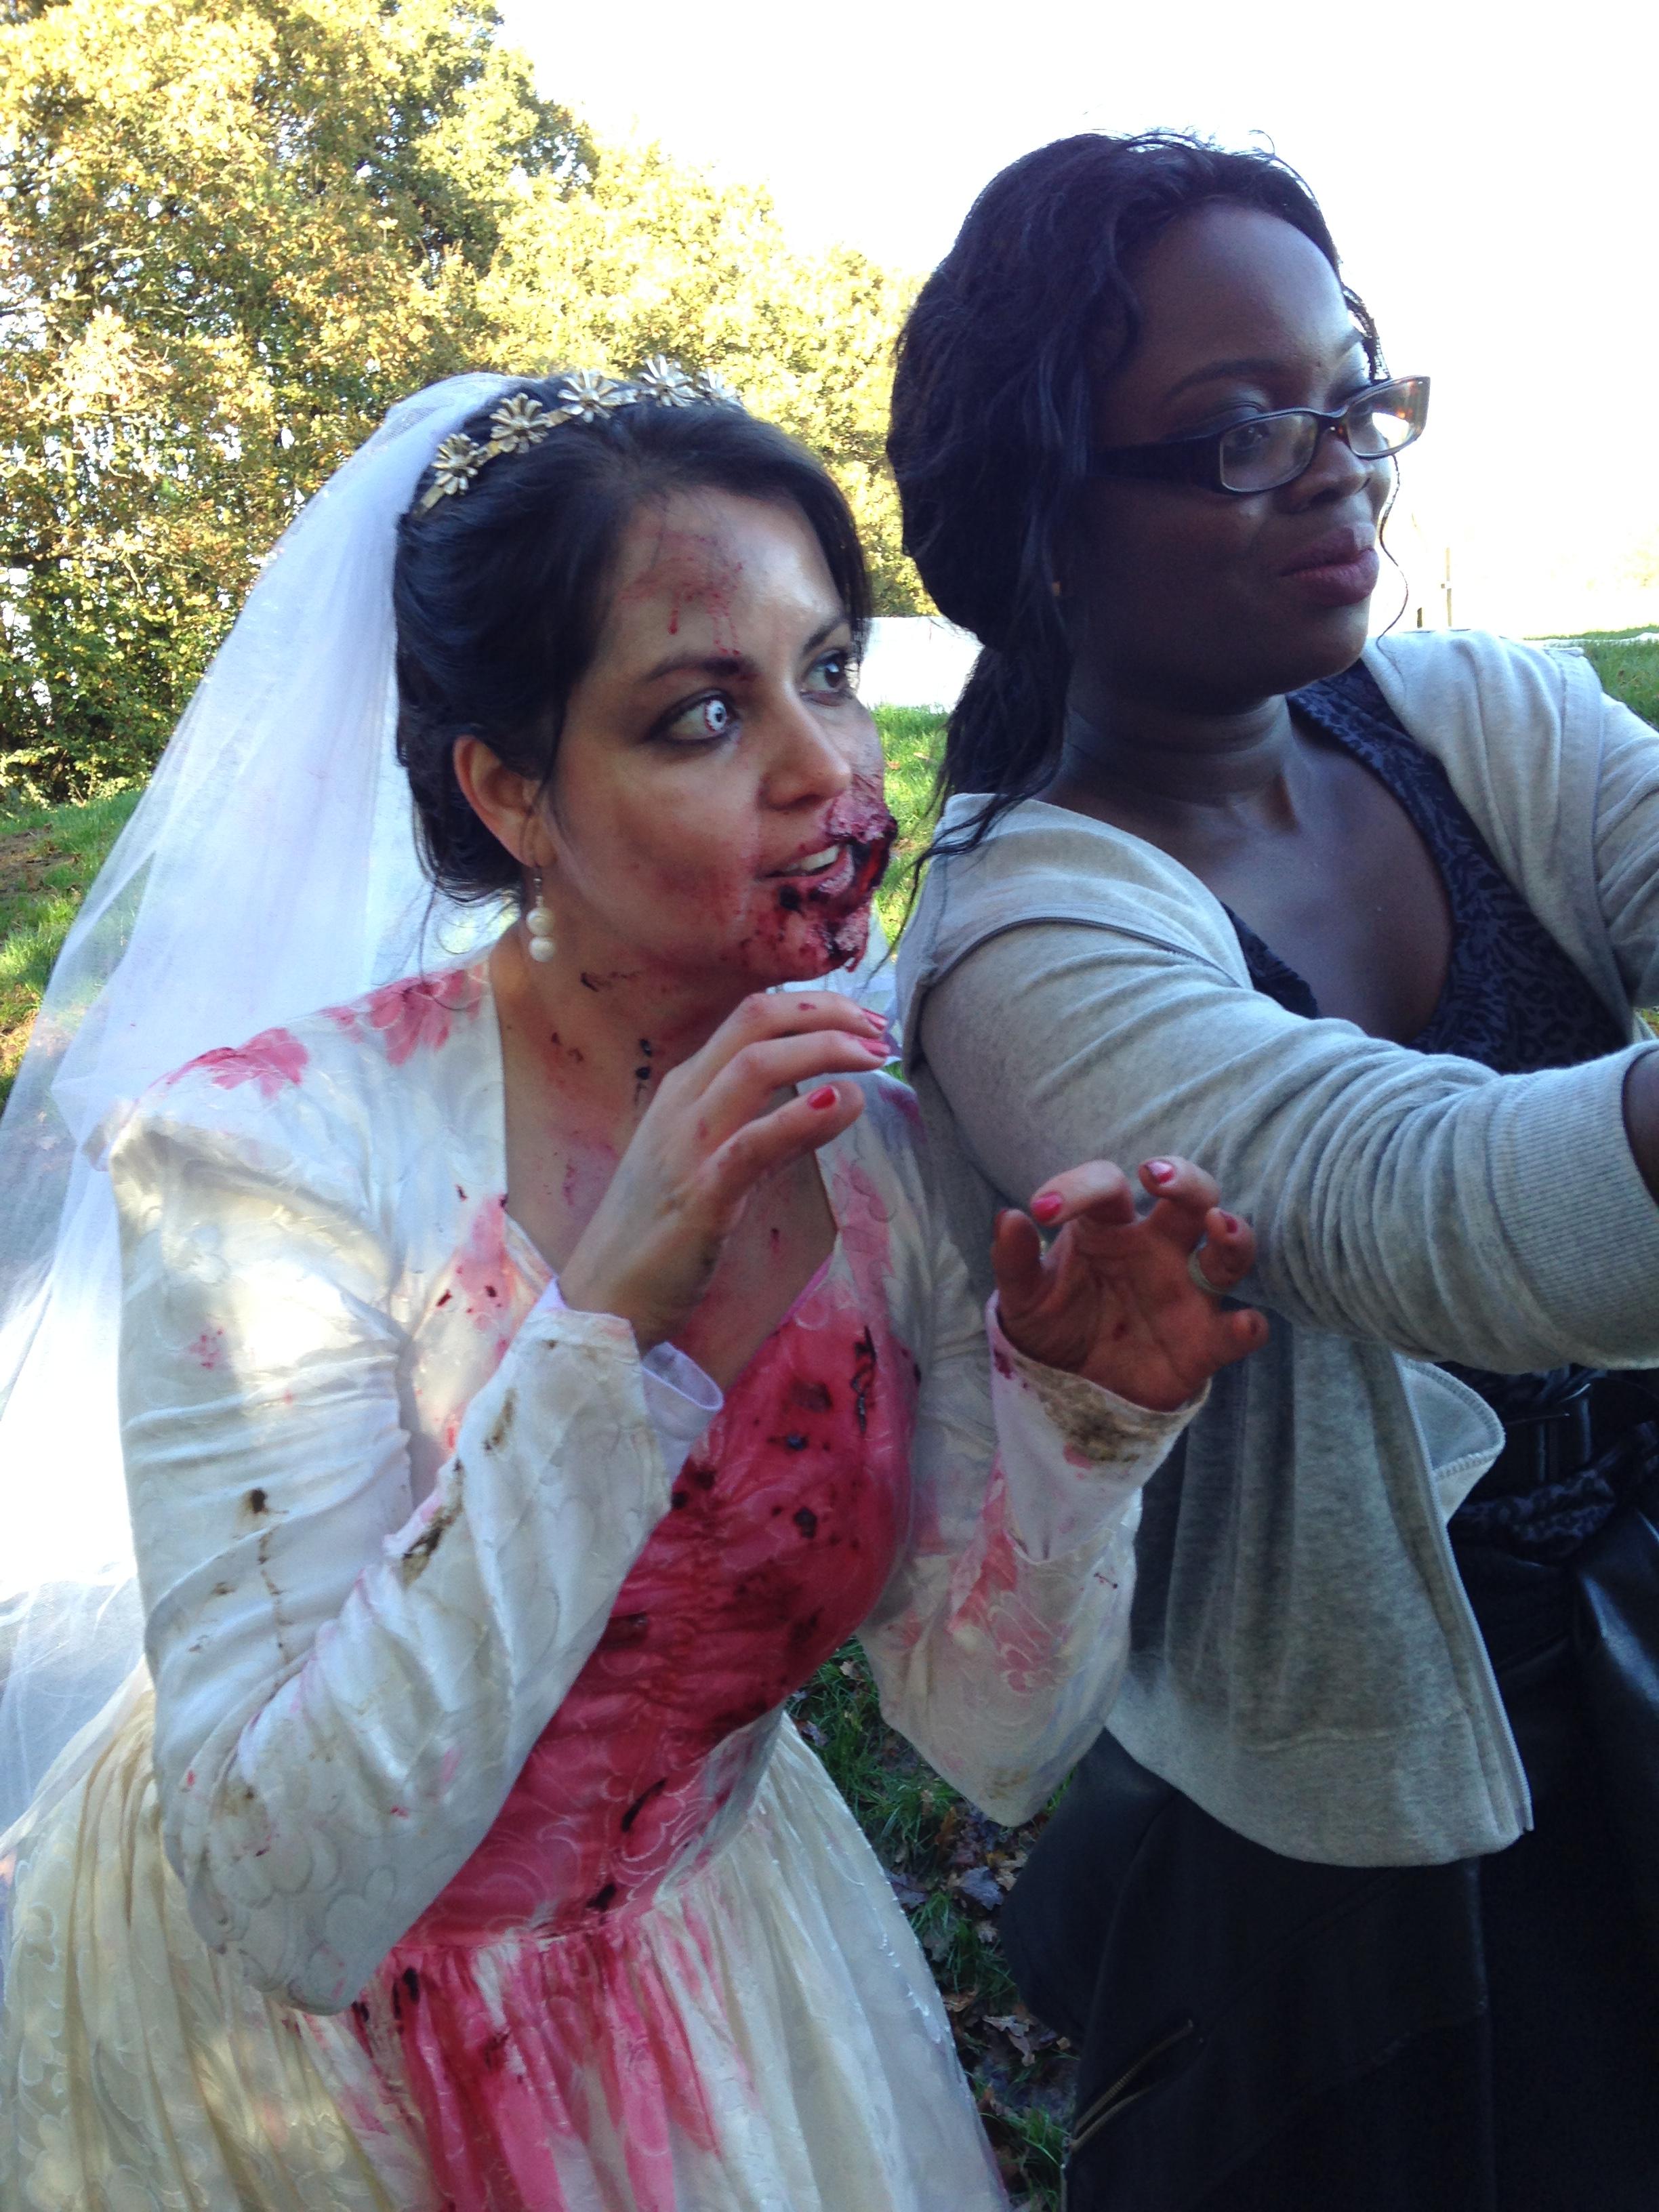 zombie evacuation race